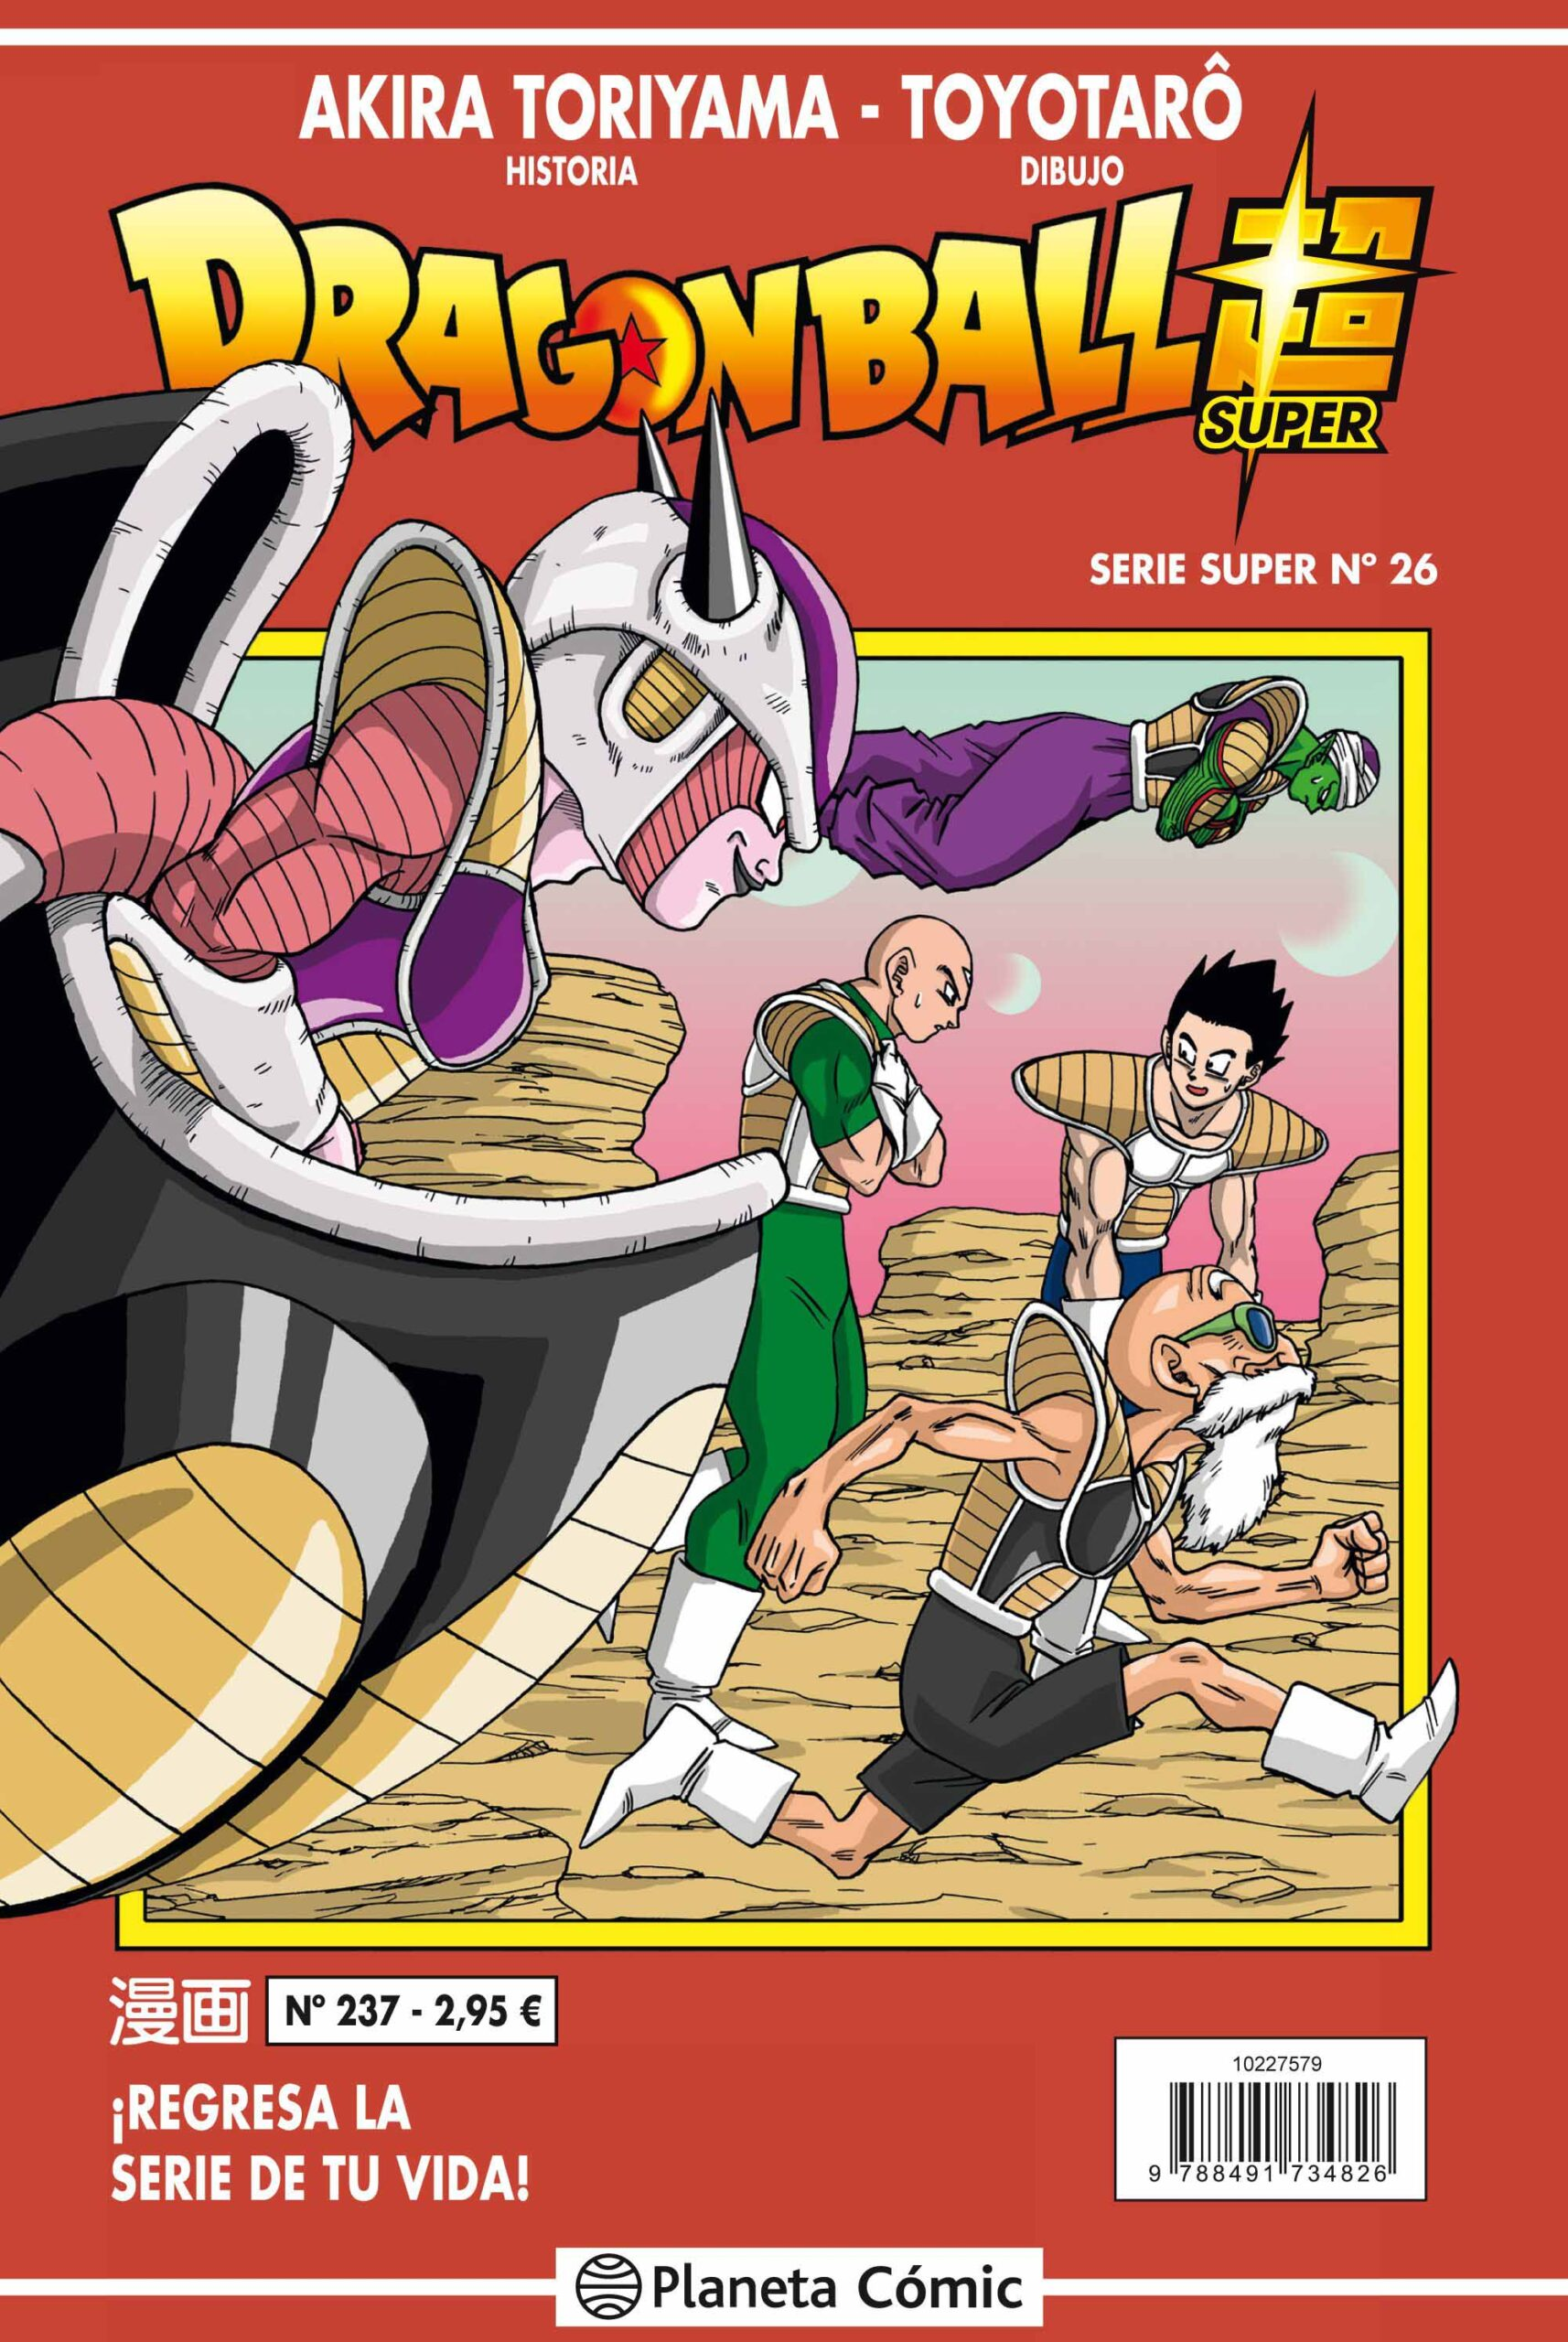 'Dragon Ball Super' 26 / 237. Reseña del manga de Toriyama